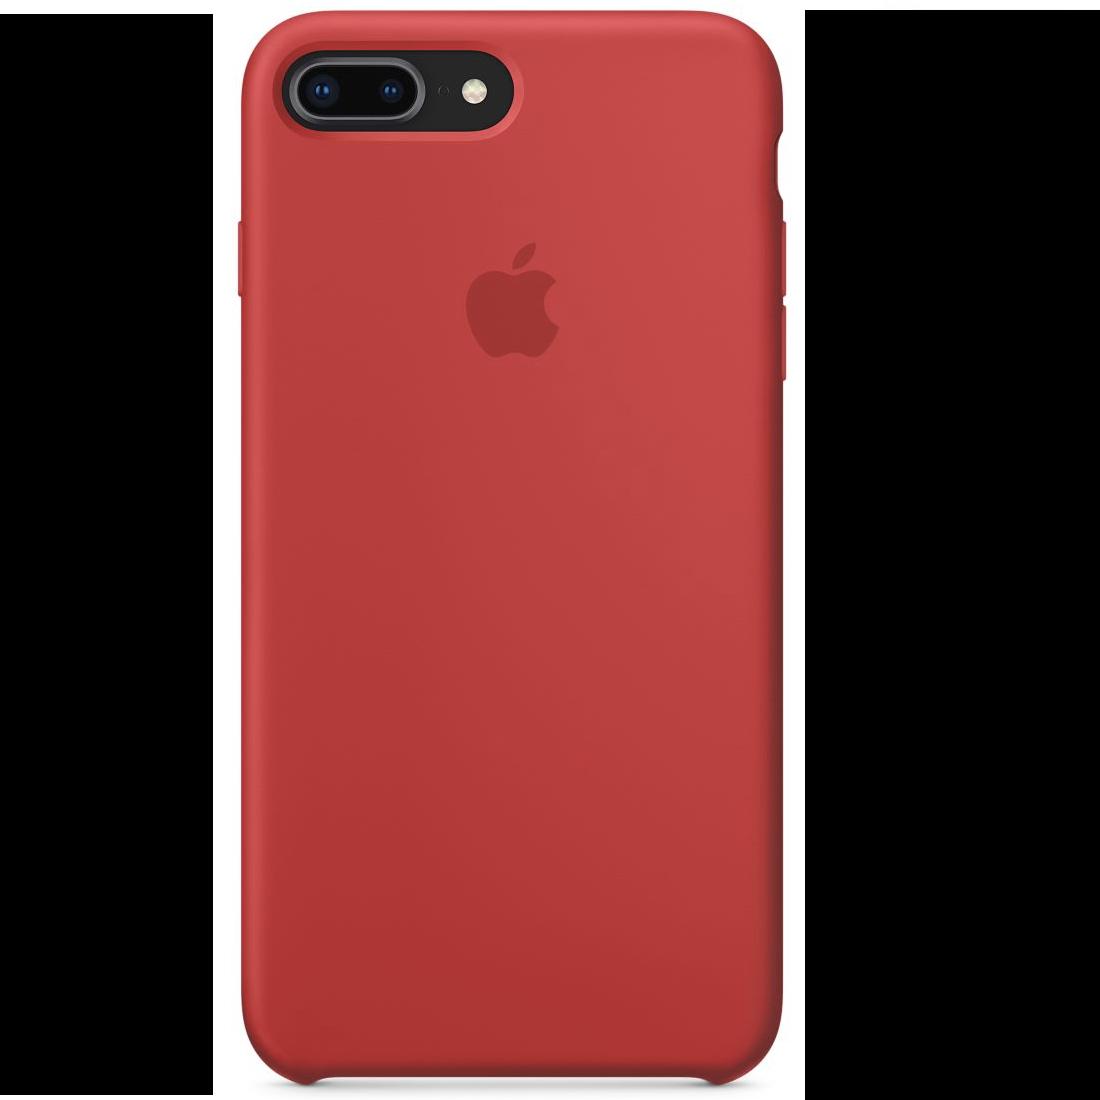 Recensione: Custodia in silicone per iPhone 8 Plus e 7 Plus ...